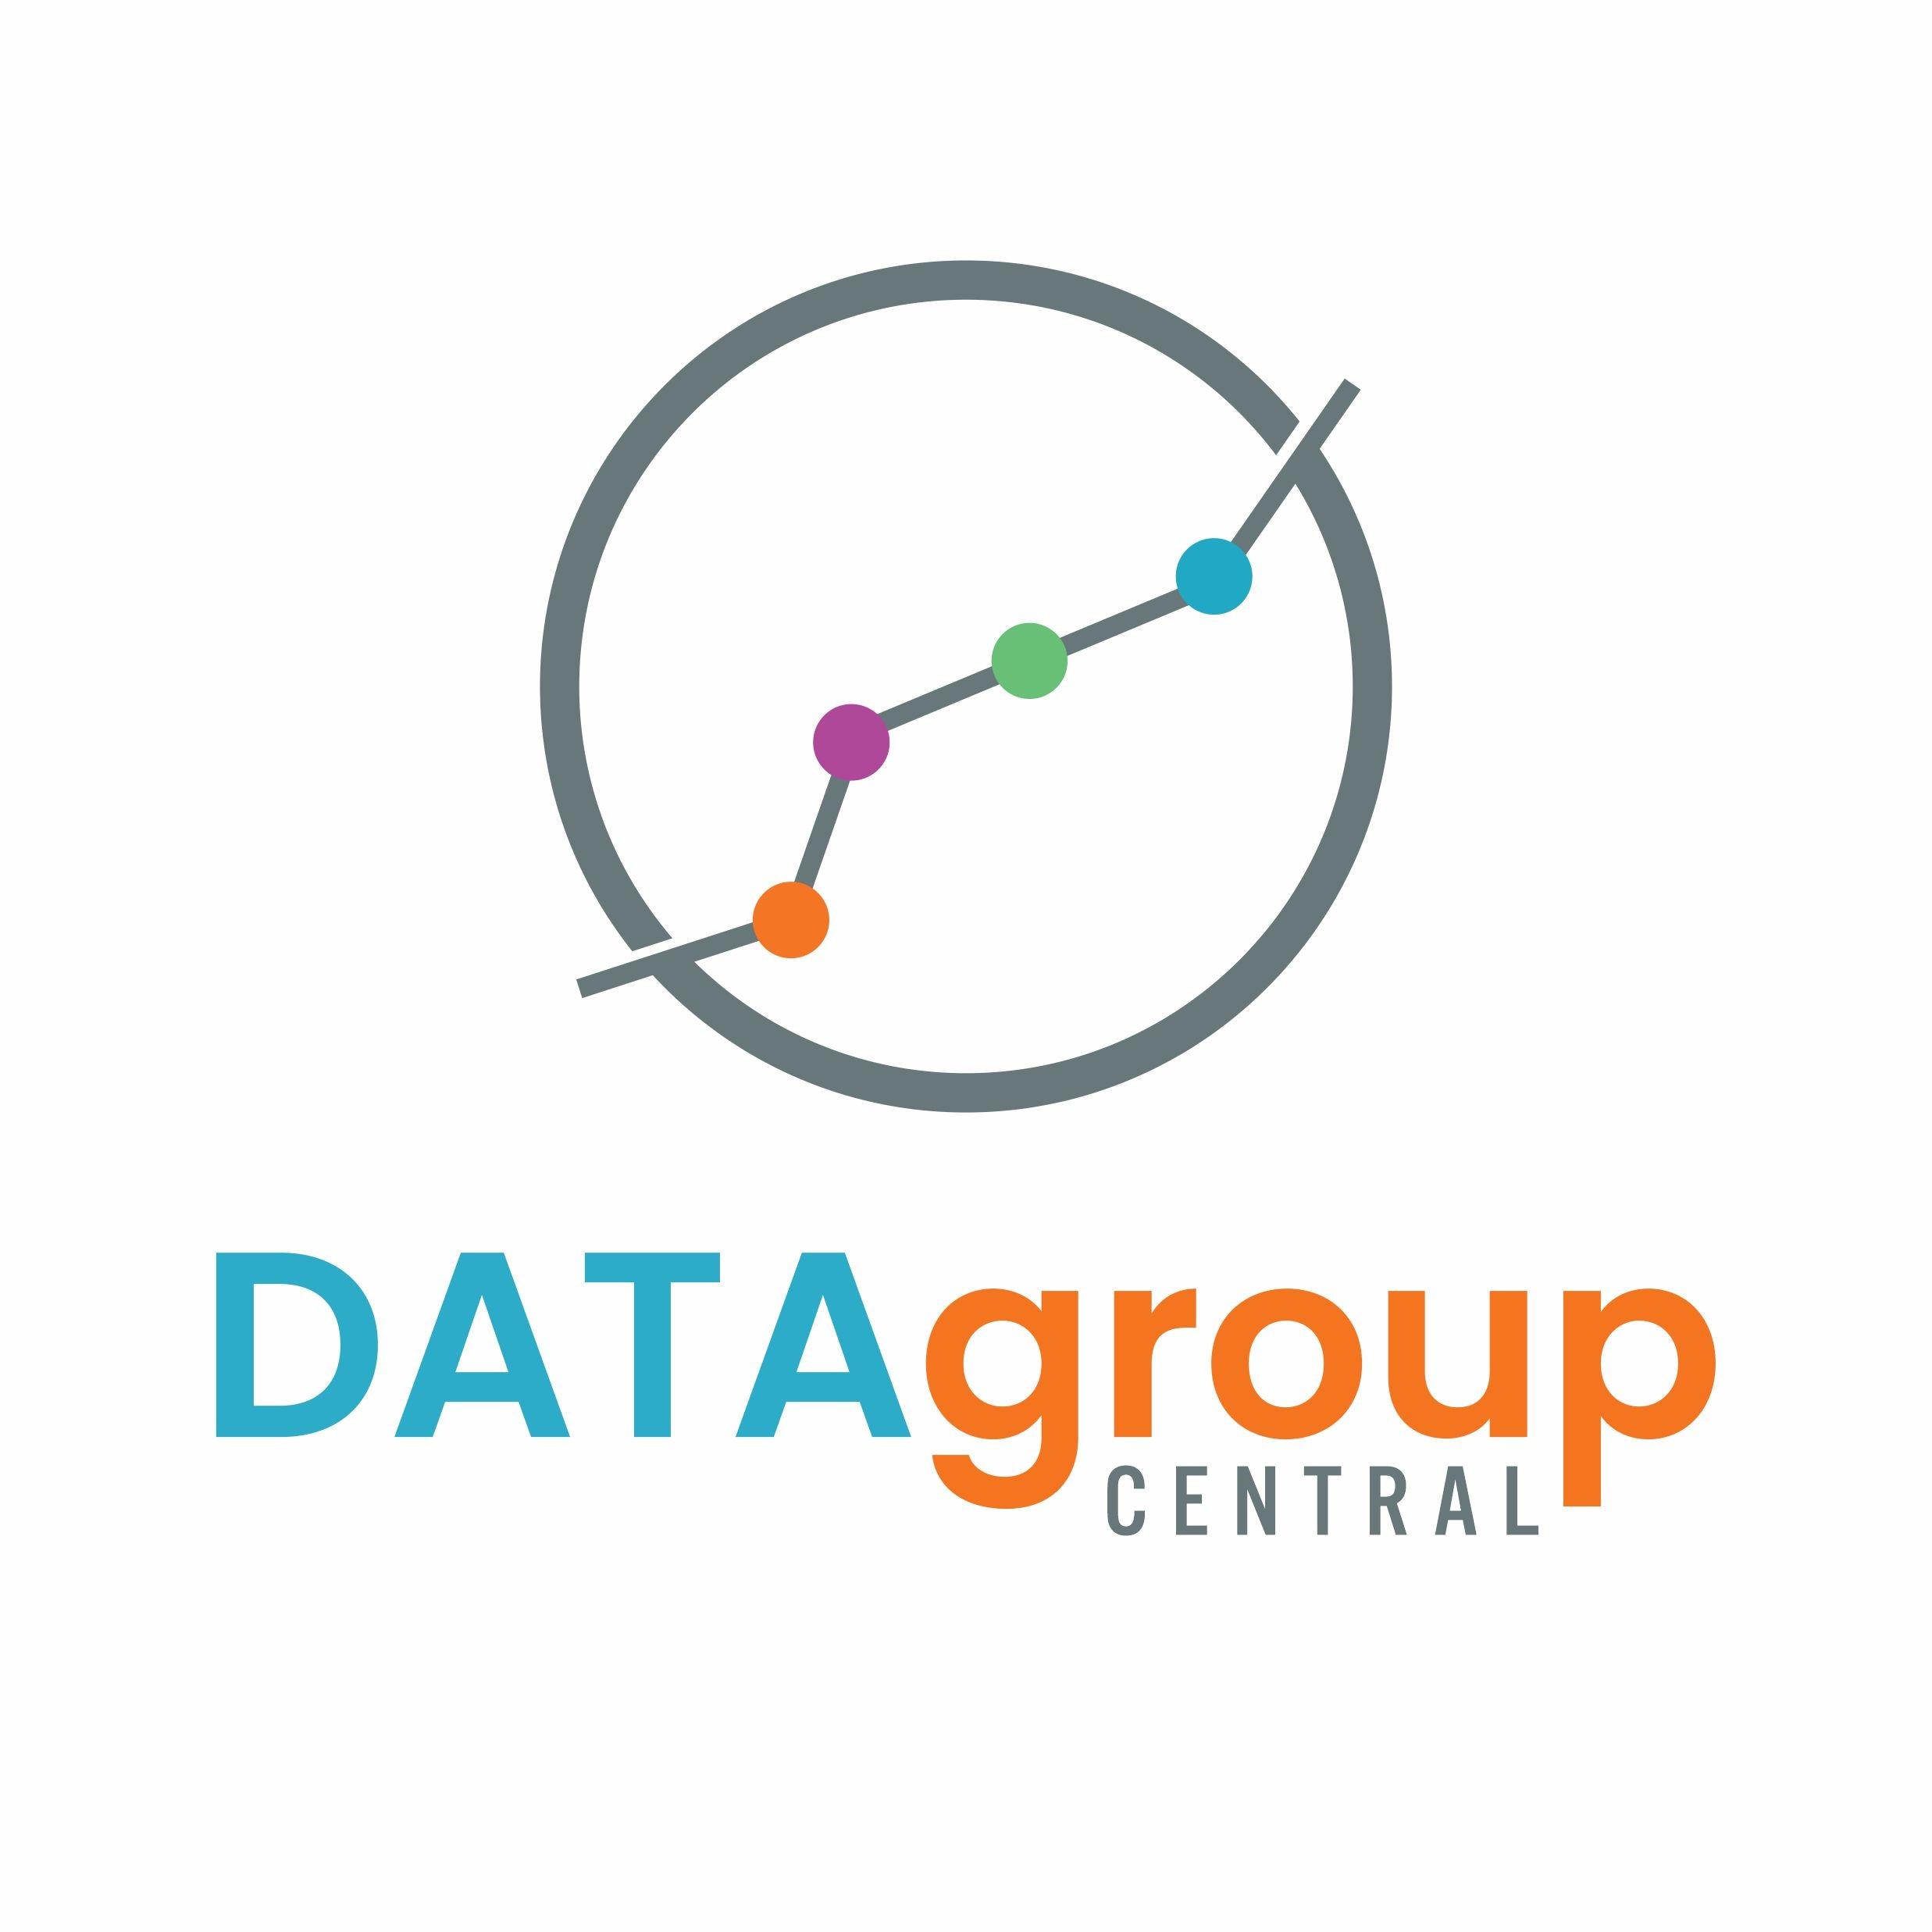 DATA Group Central logo